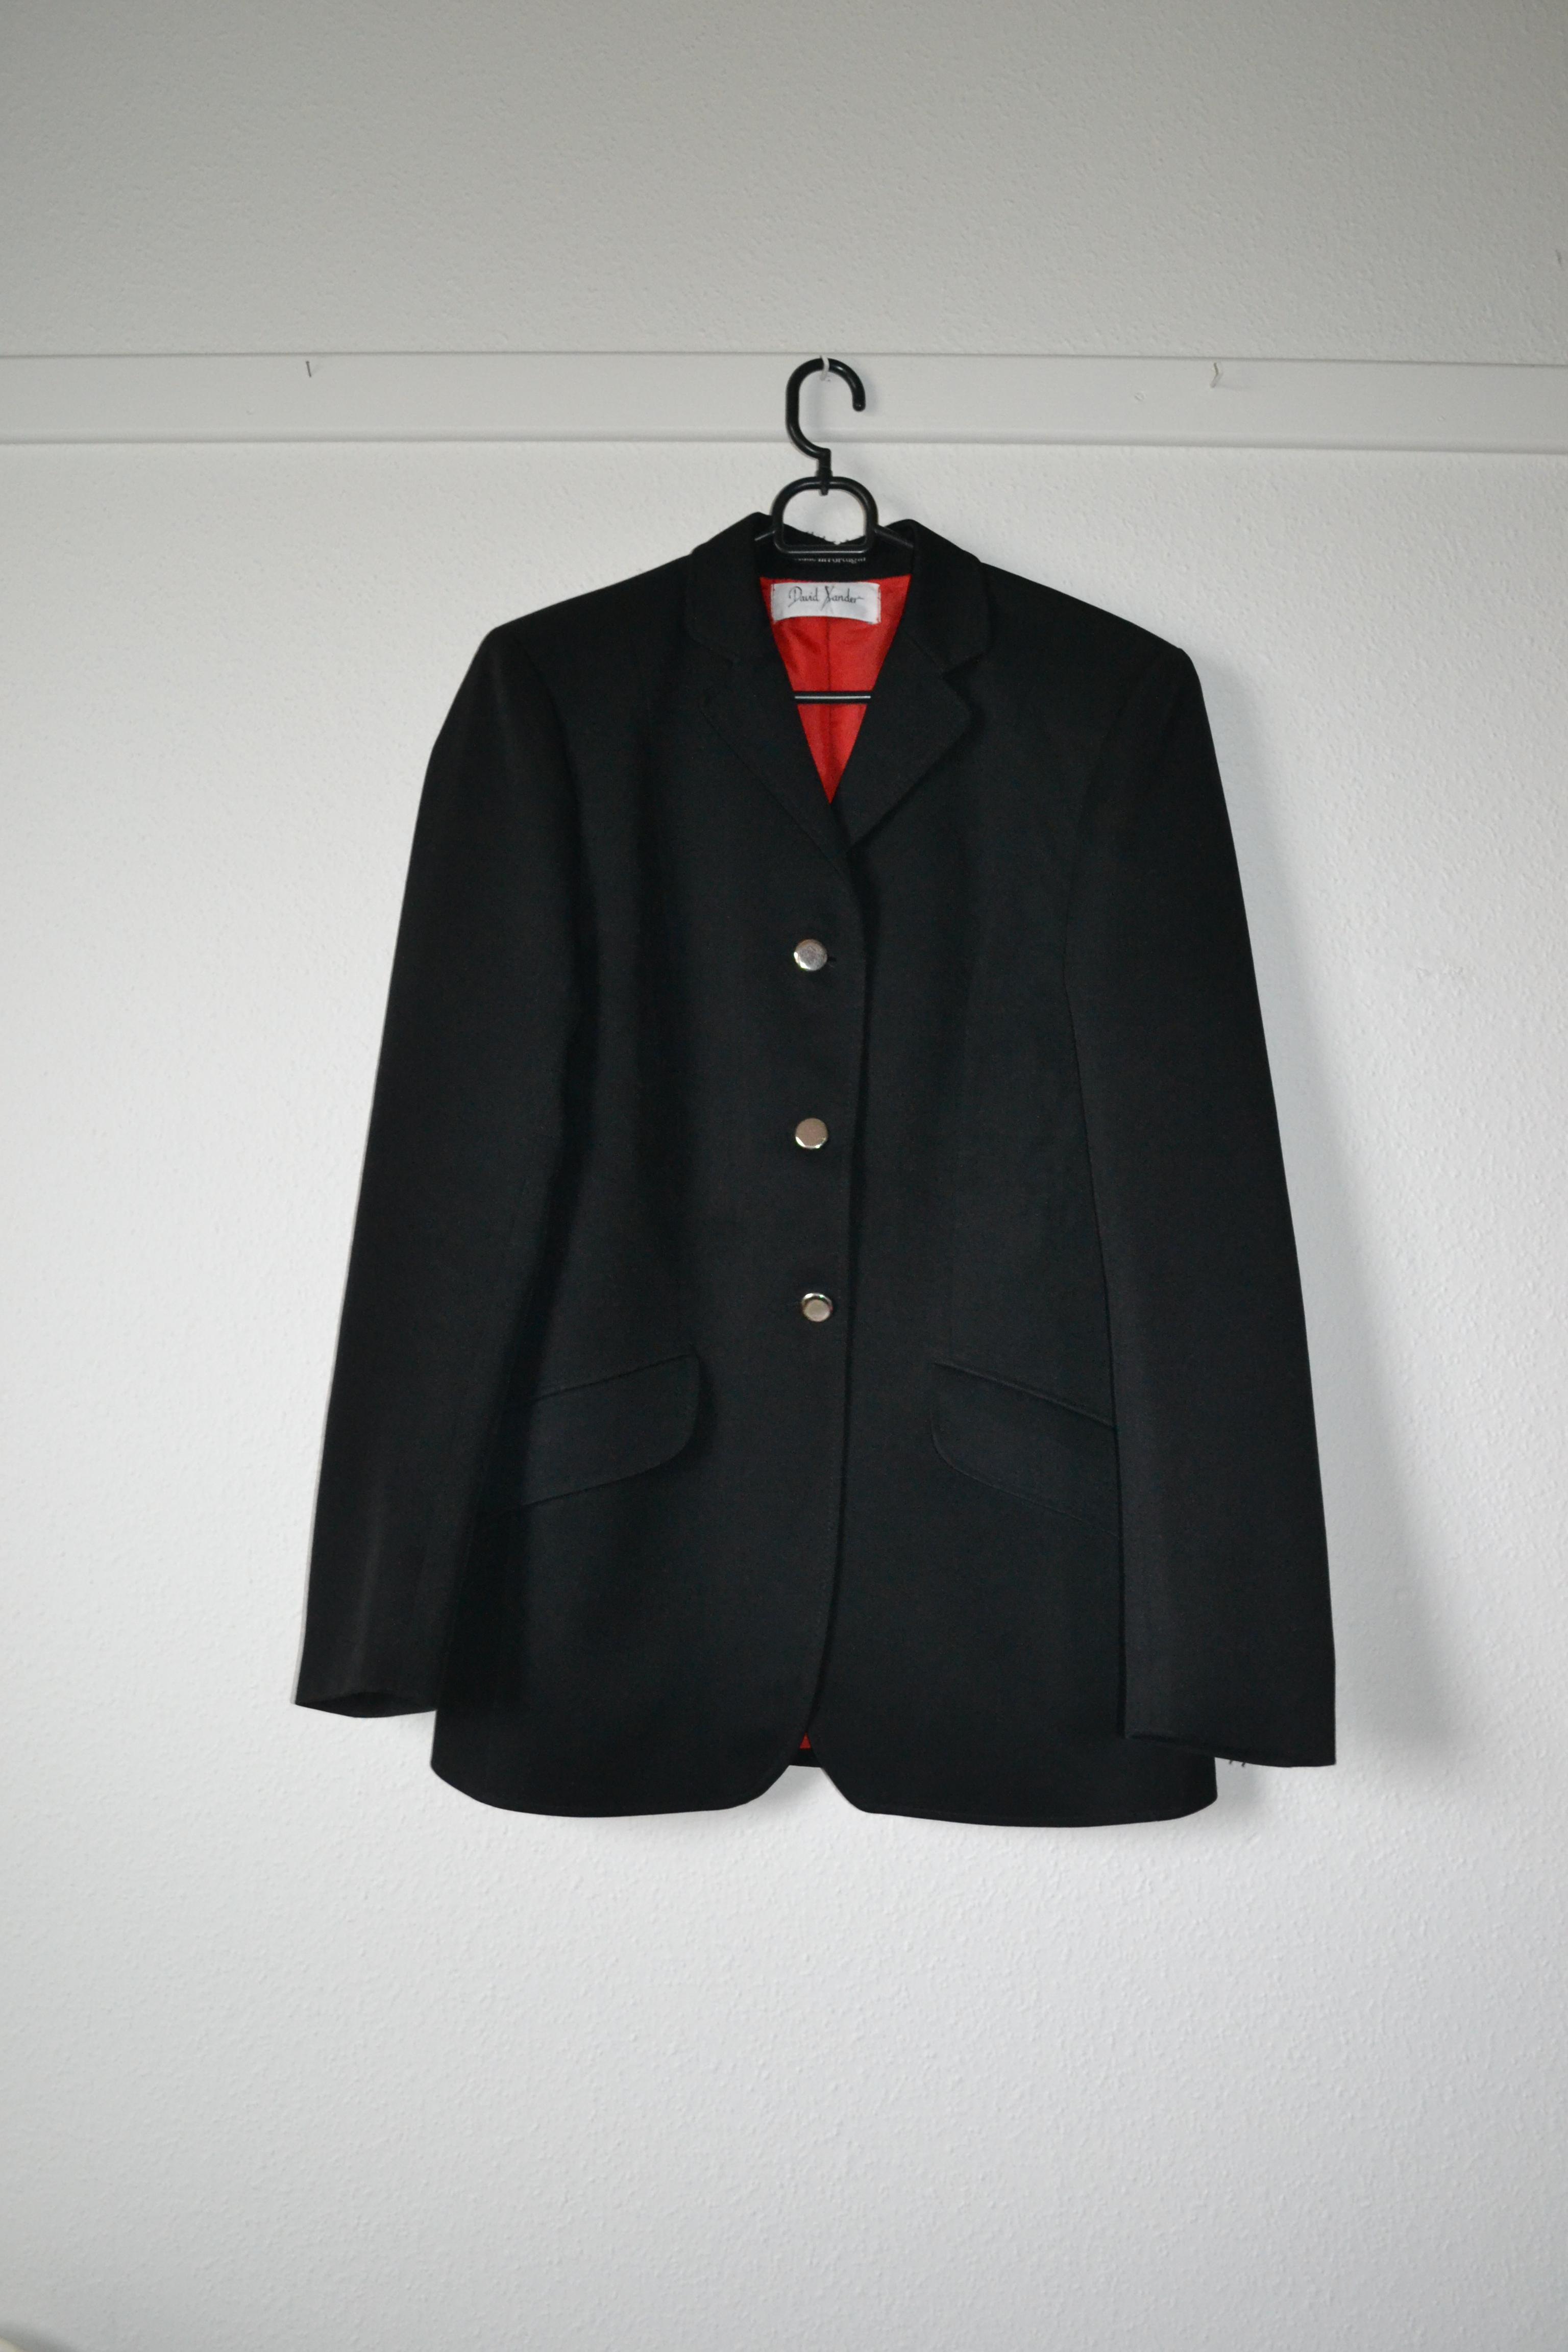 sort blazer